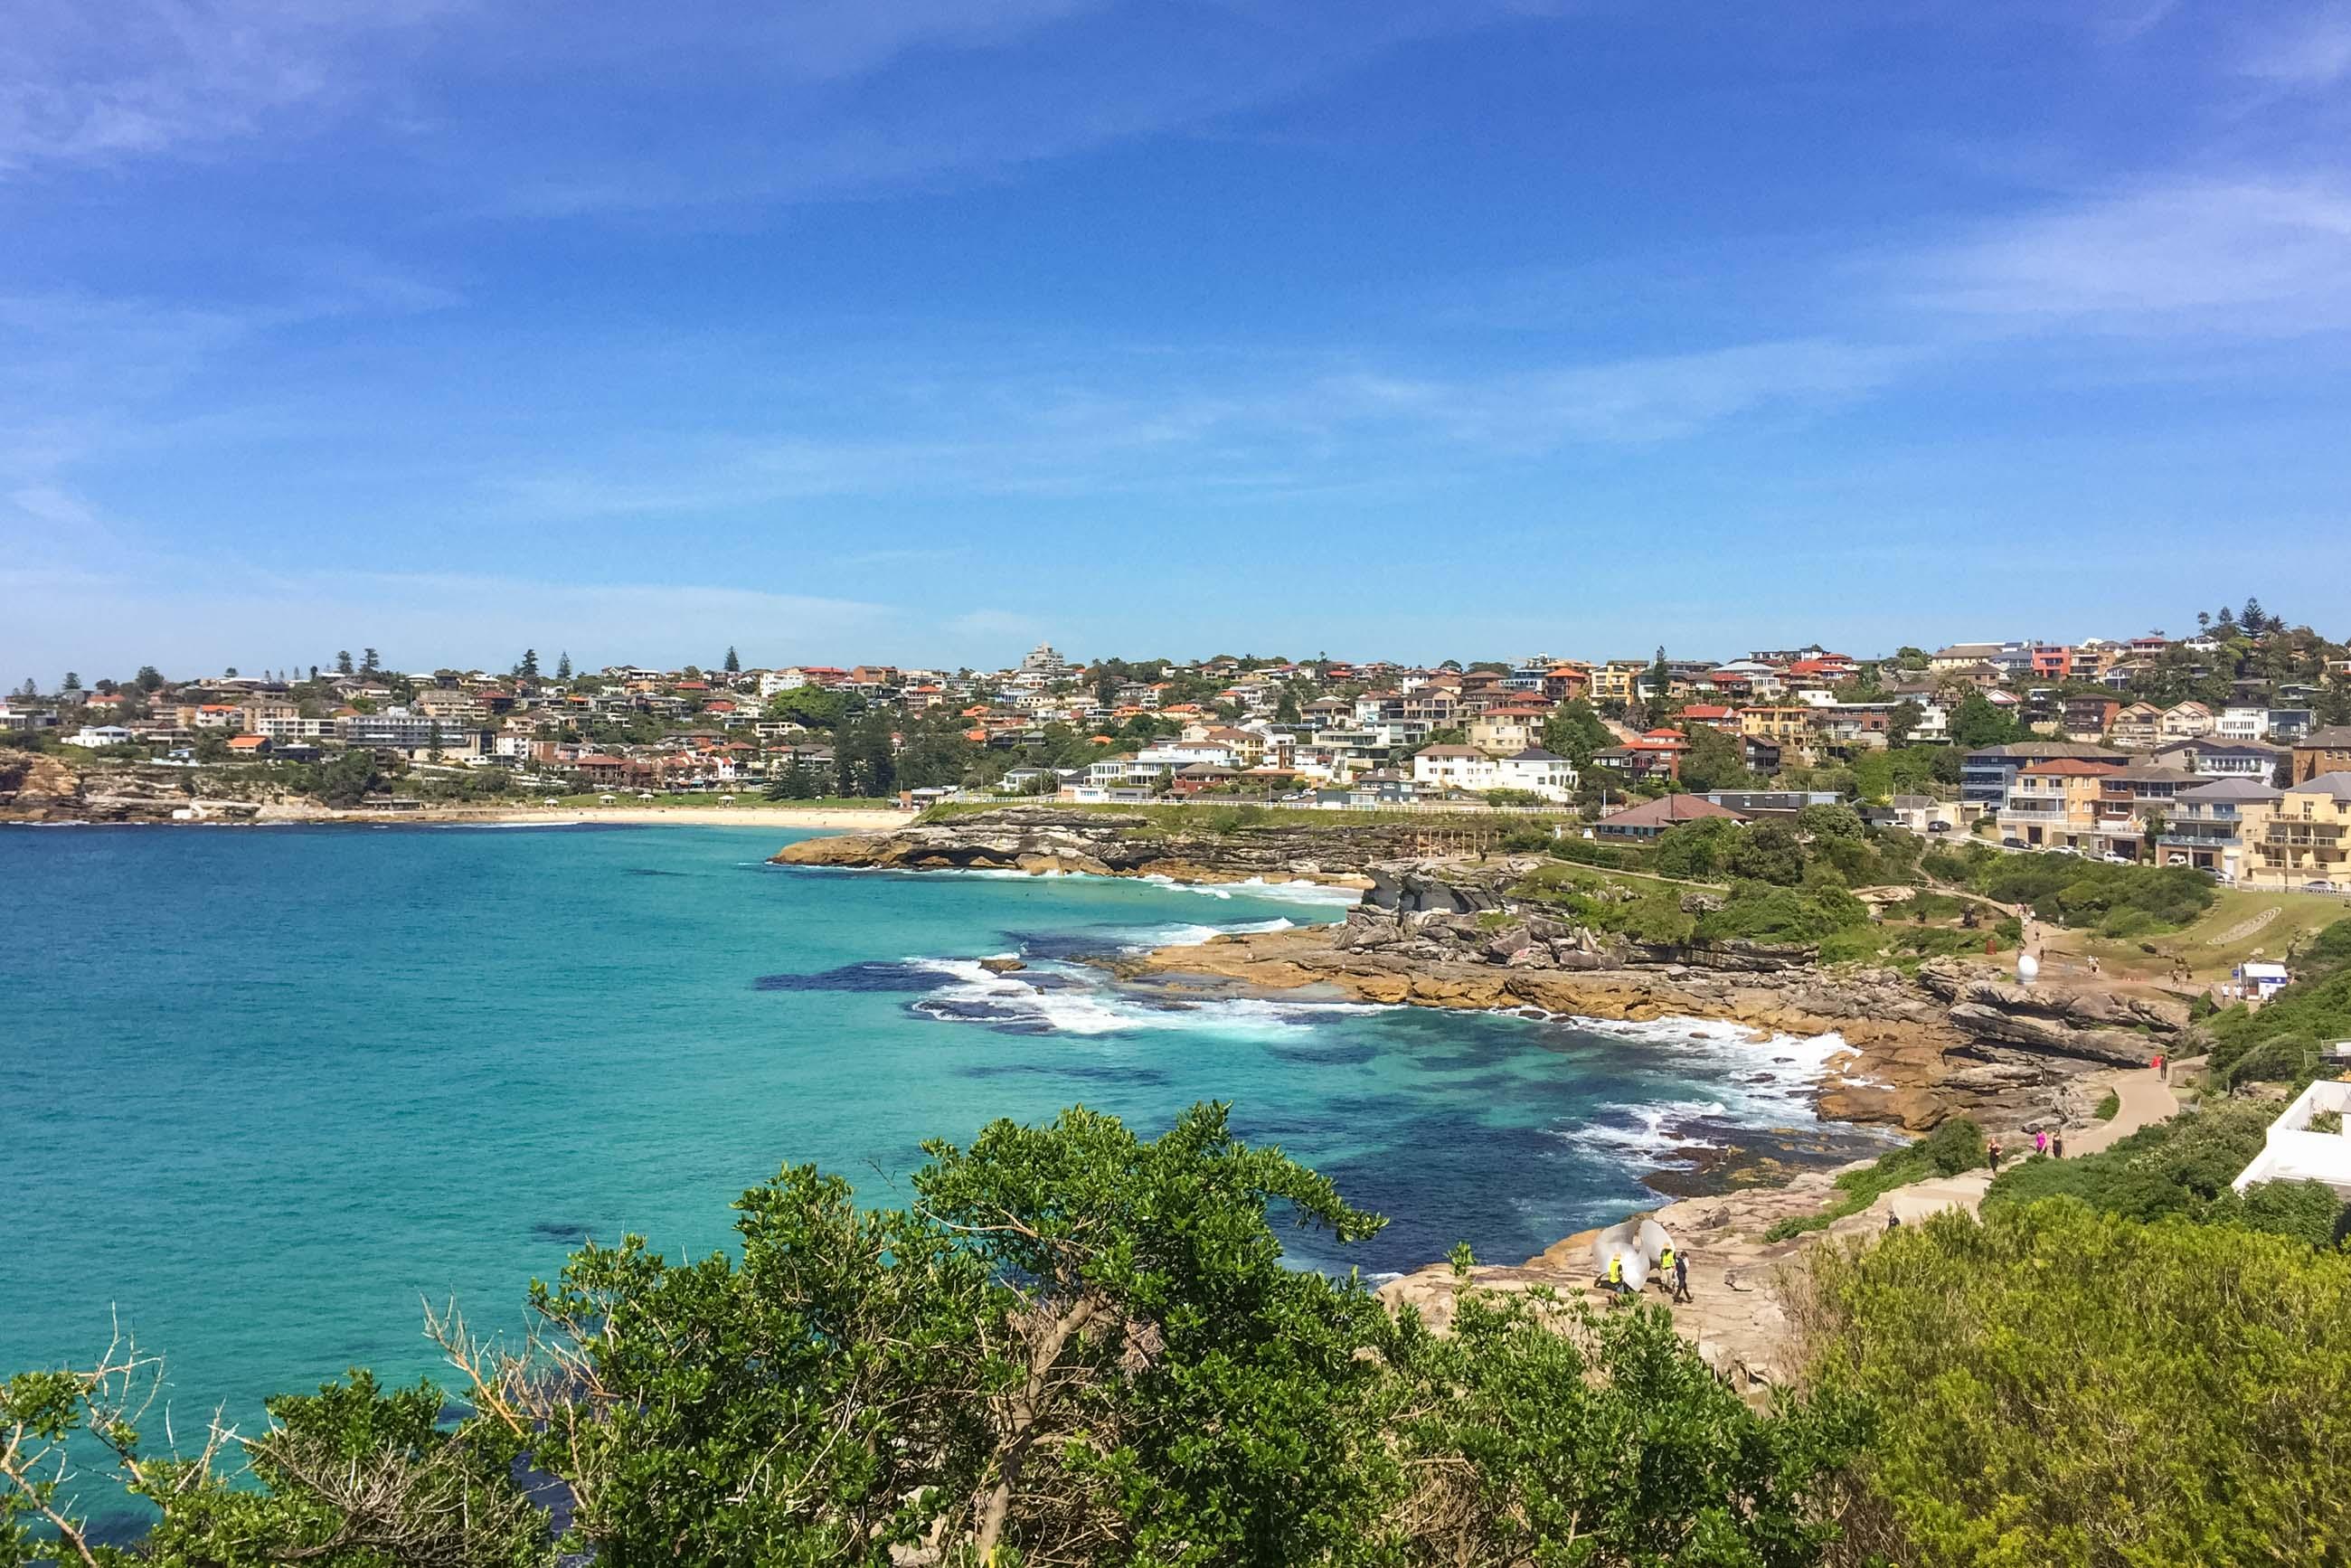 https://bubo.sk/uploads/galleries/5028/veron_hulikova_australia_sydney_bondi_beach_pohlad_nabronte2.jpg